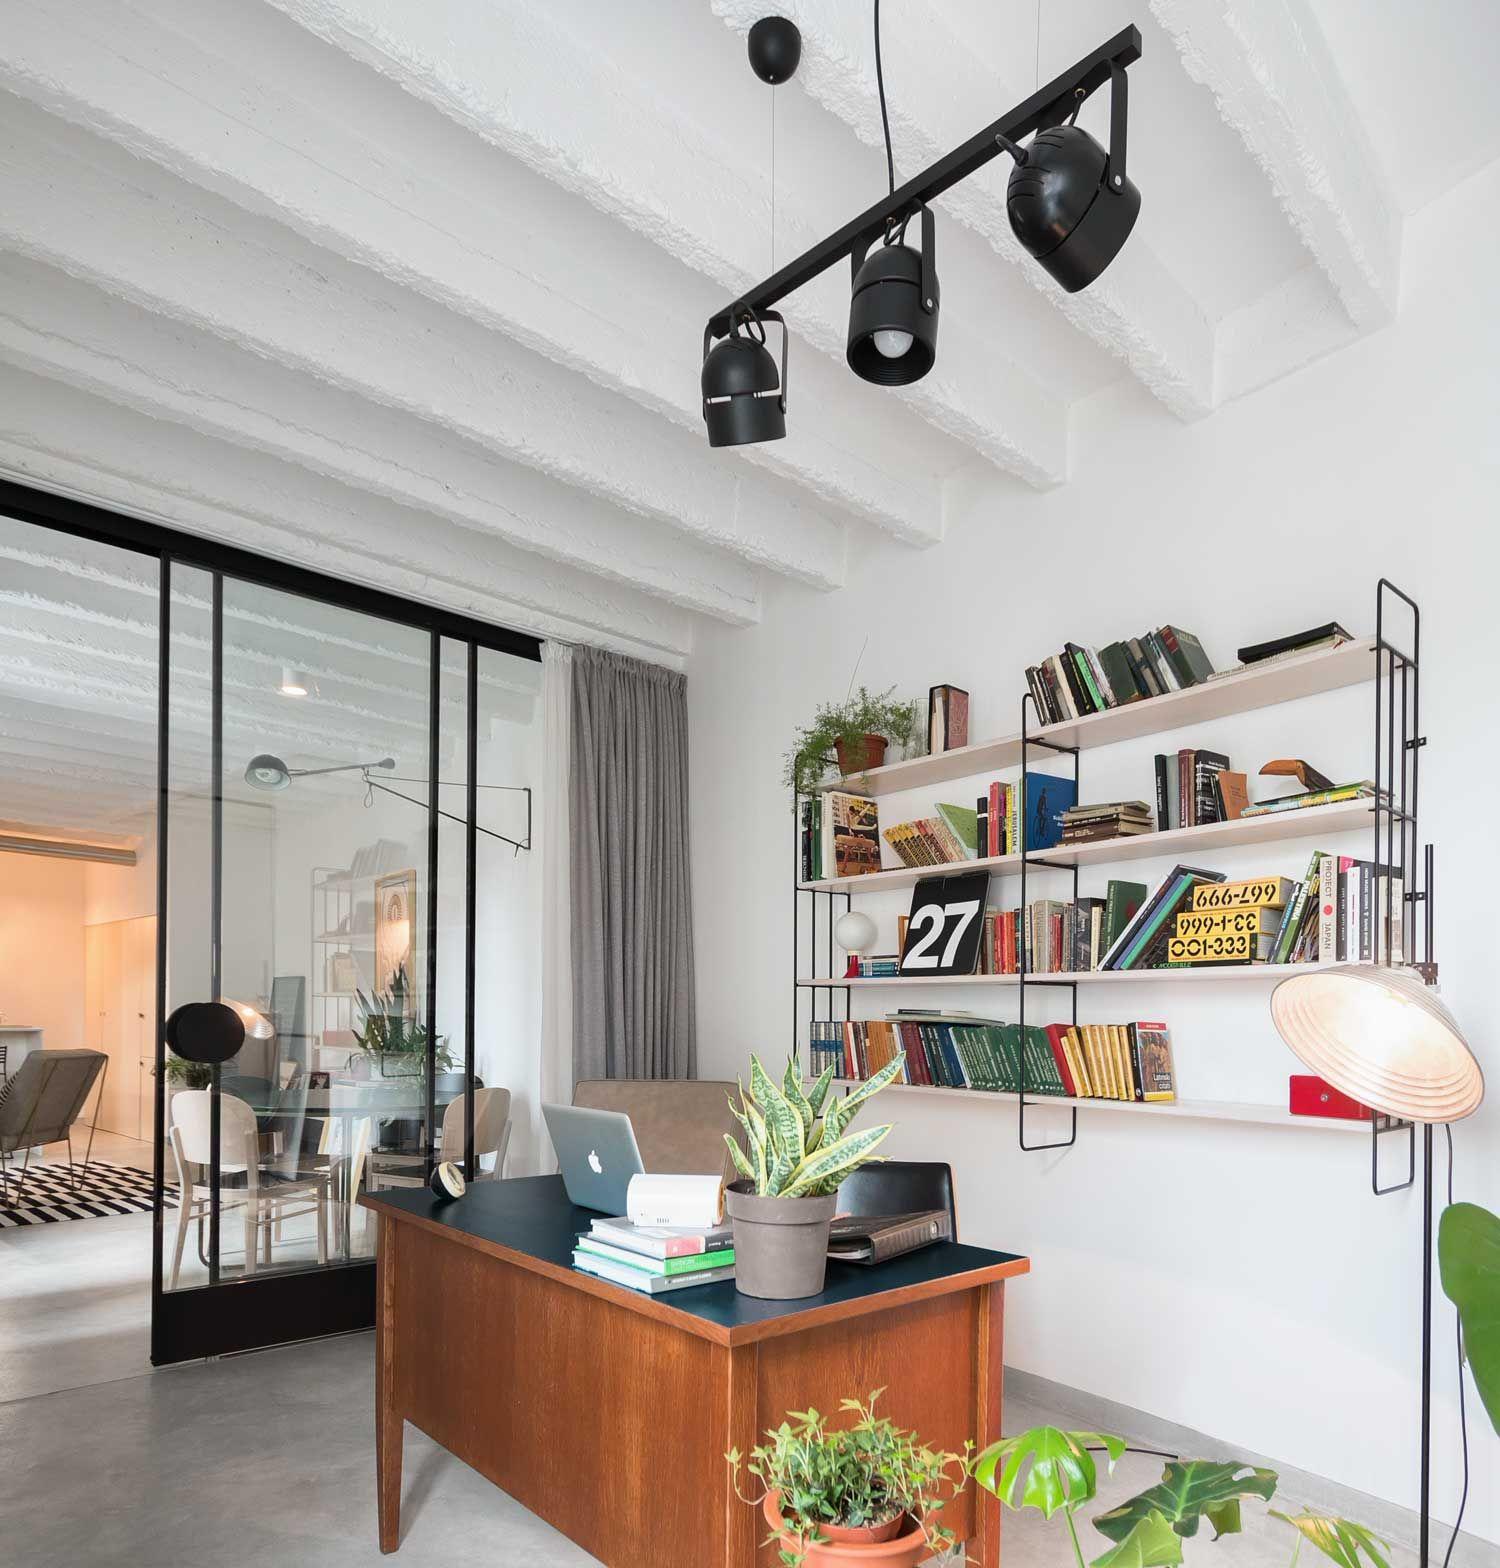 Private Apartment In Belgrade By Studio Autori Apartment Design Stylish Apartment Home Office Design